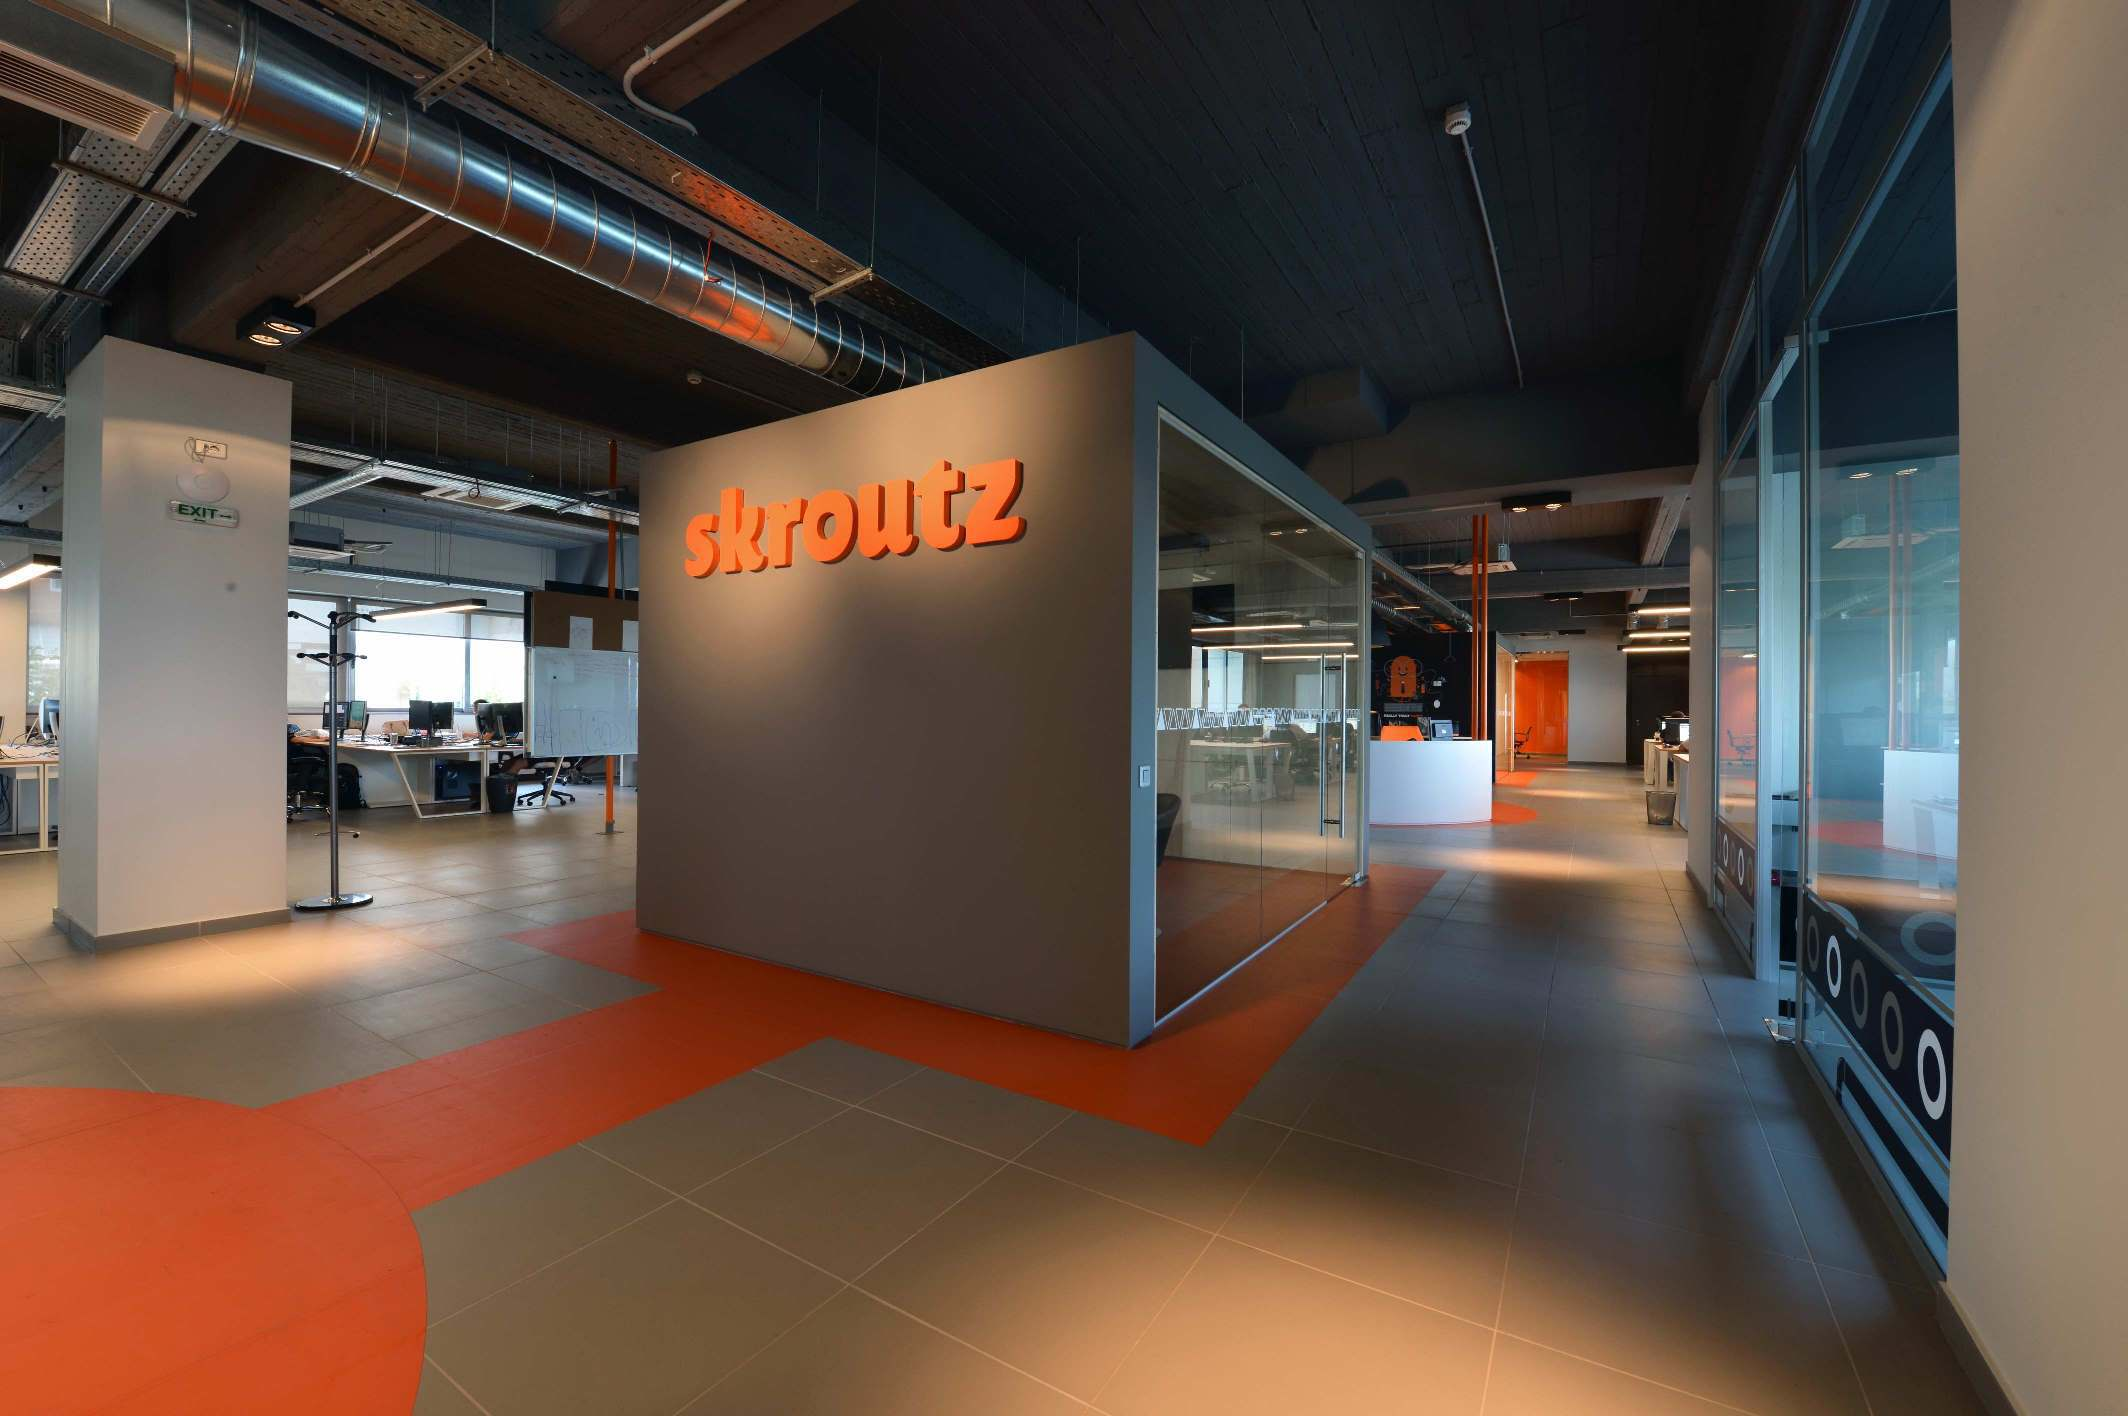 Skroutz: Αγόρασαν με 300.000 ευρώ, θα εισπράξουν εκατομμύρια ευρώ